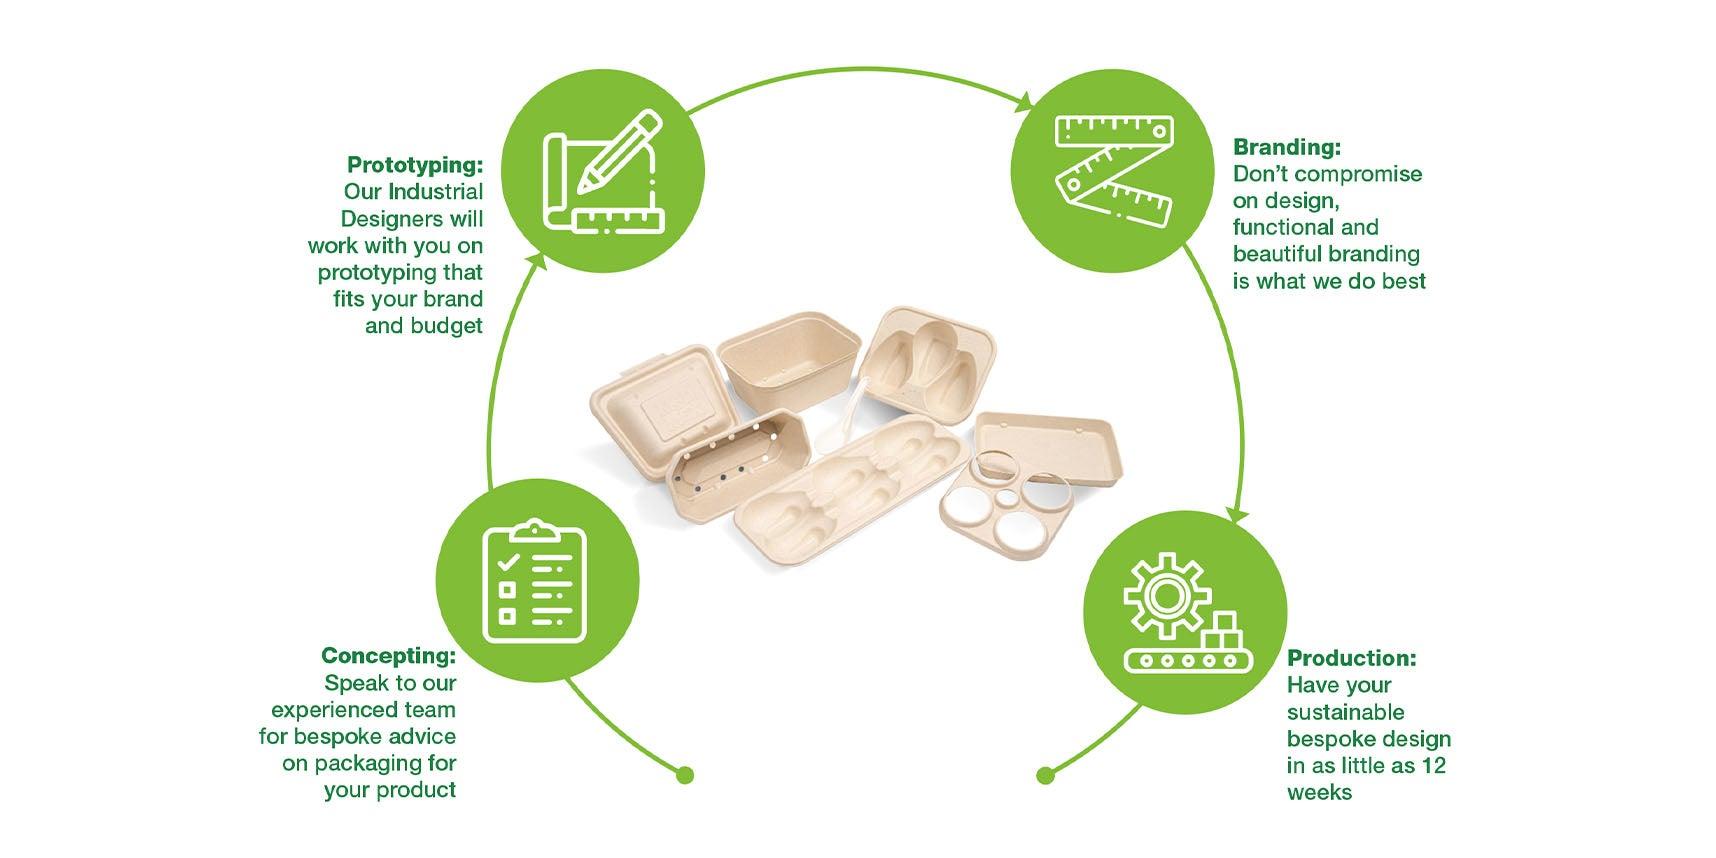 circular innovation by design